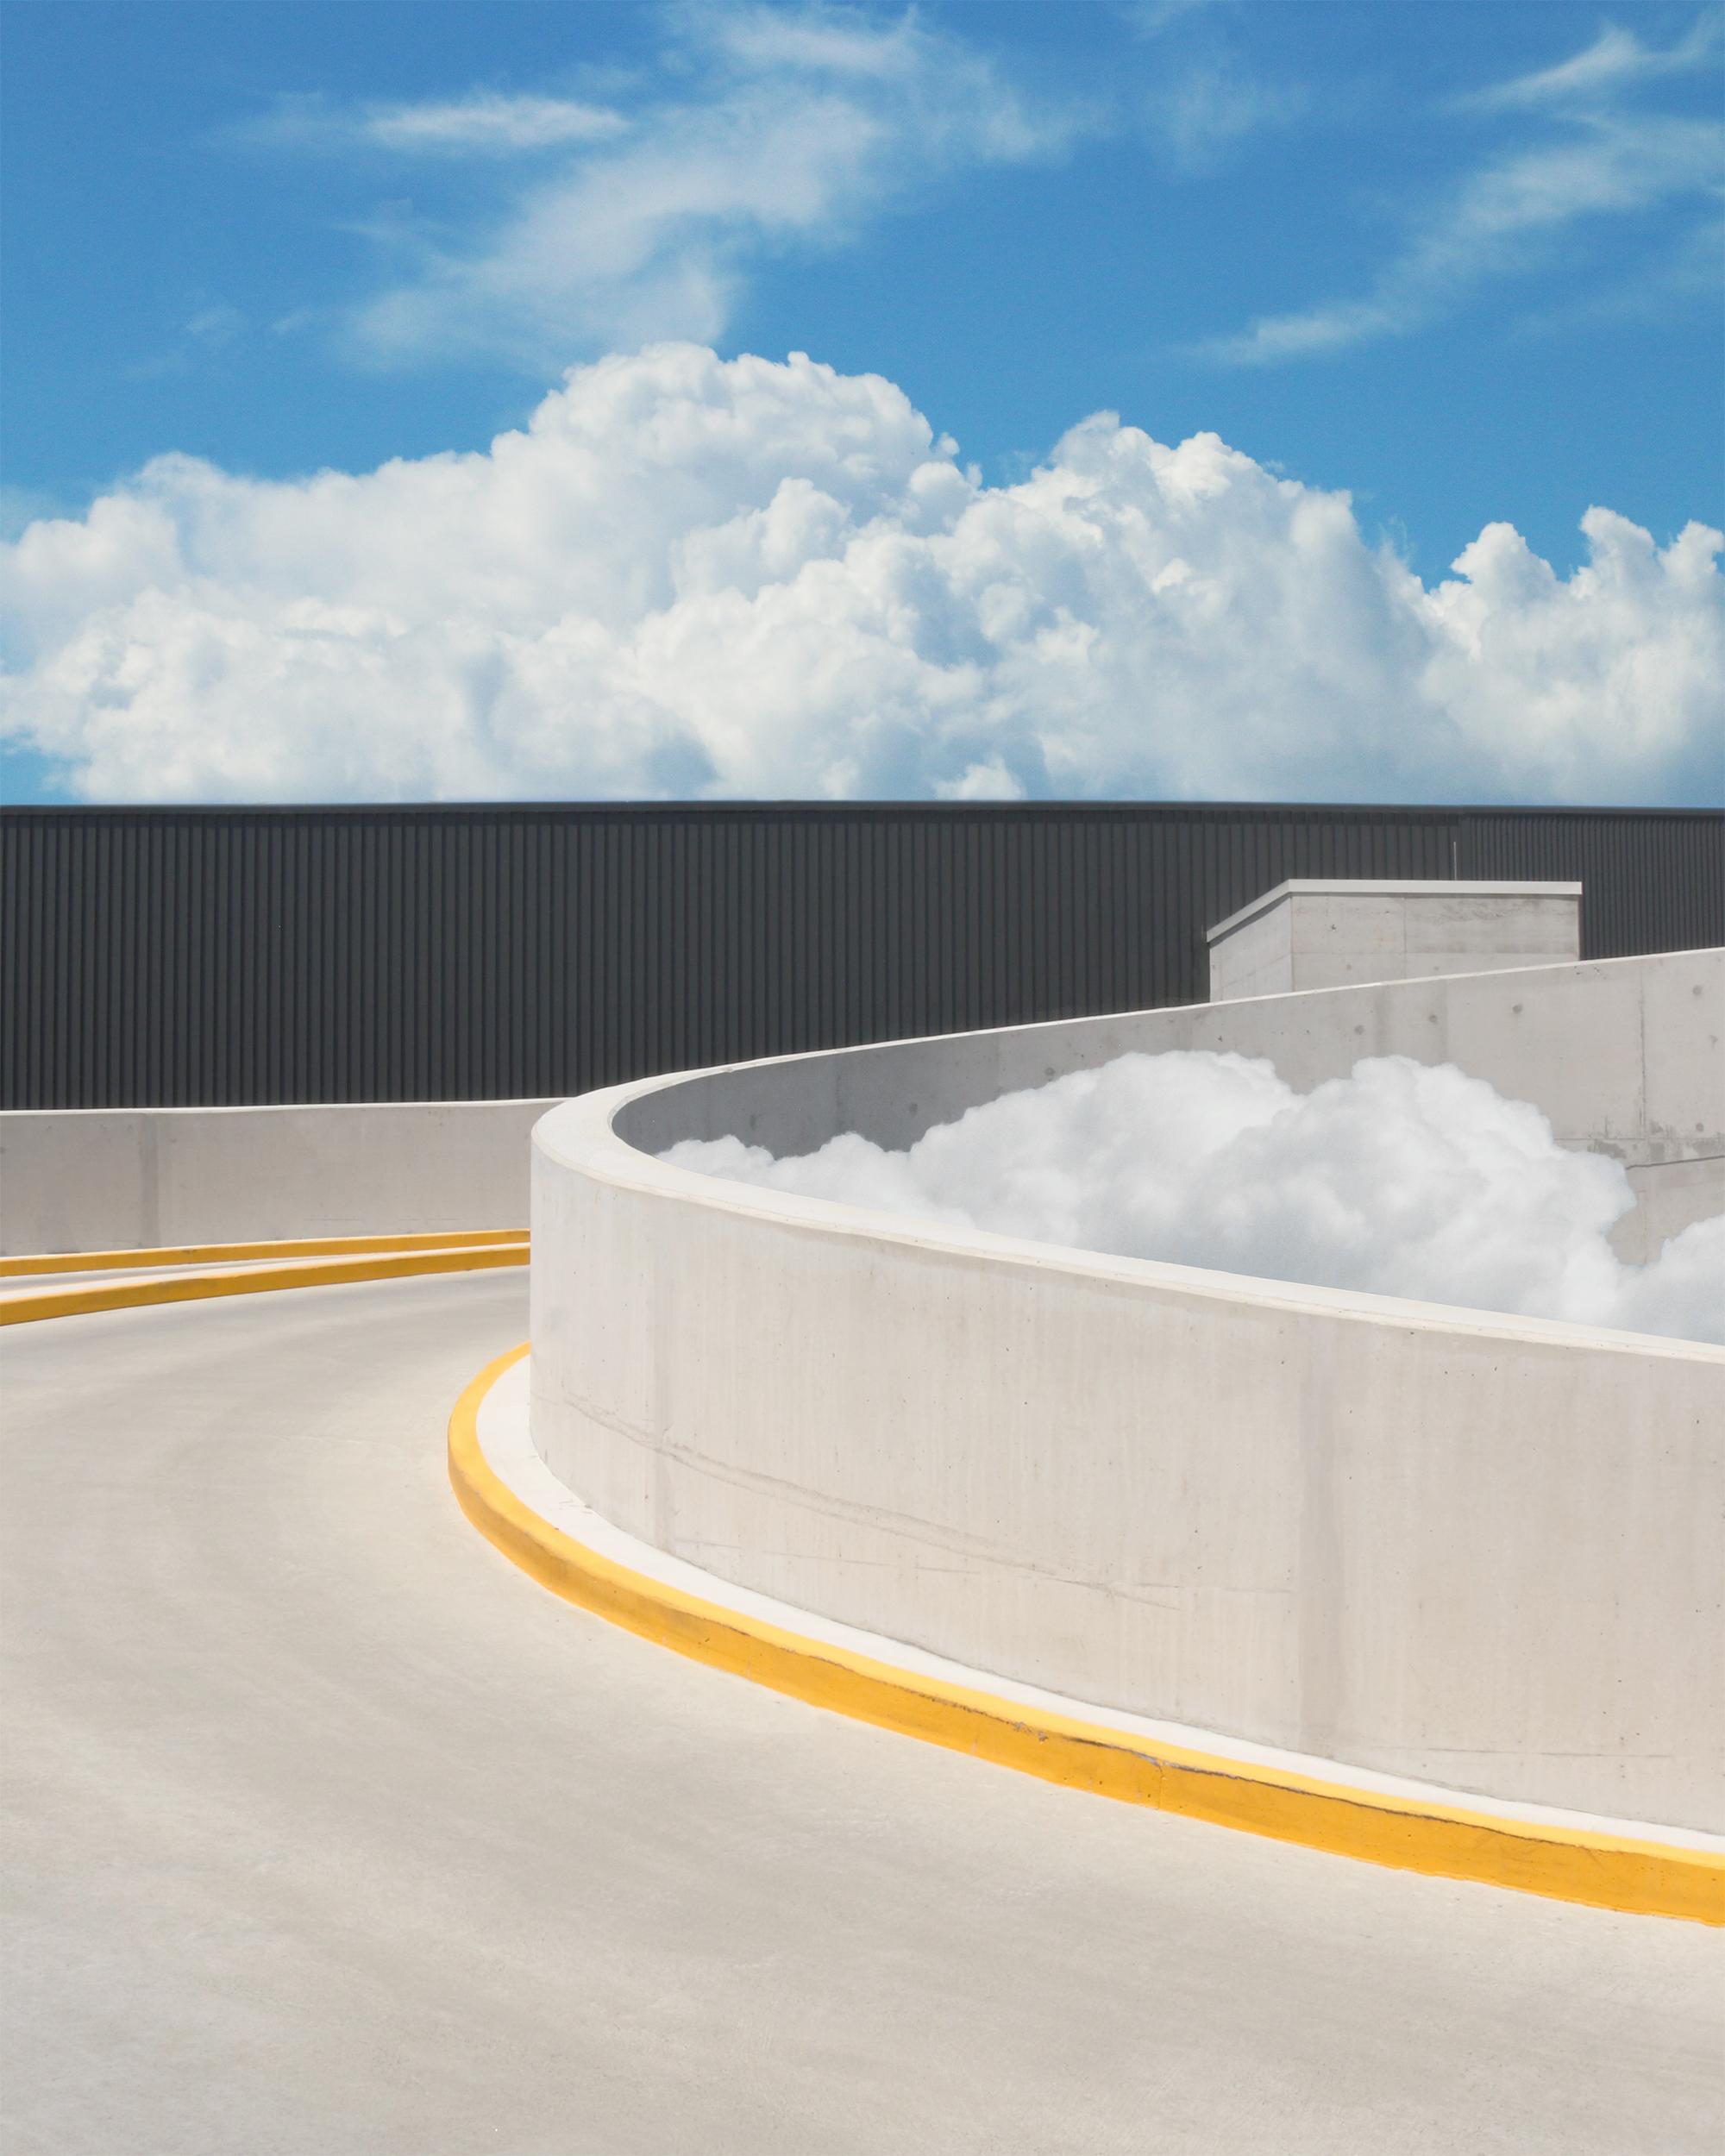 clouds carpark.jpg